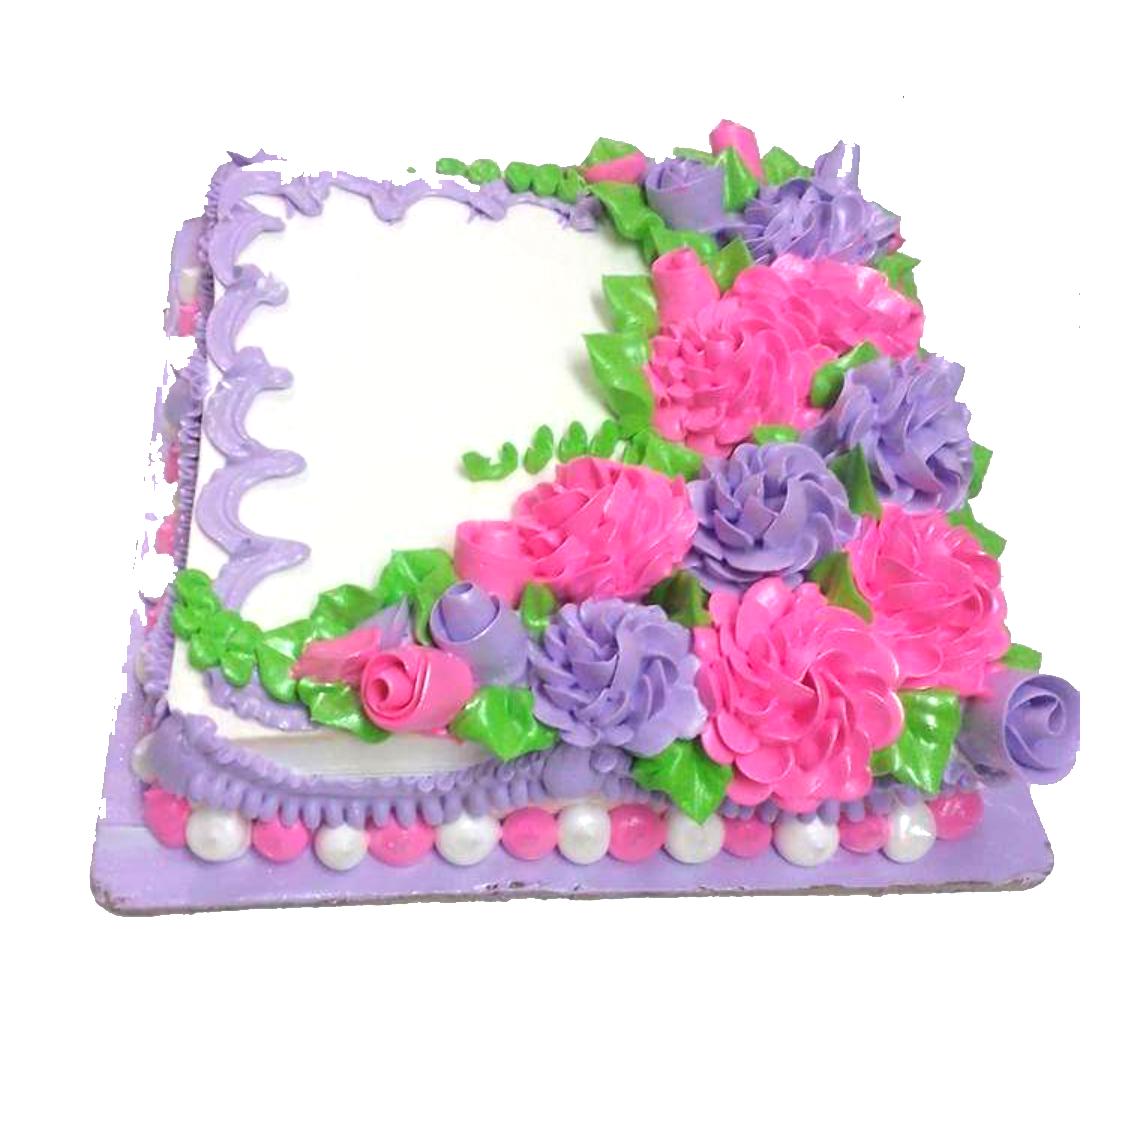 Square flowers cake izmirmasajfo Images